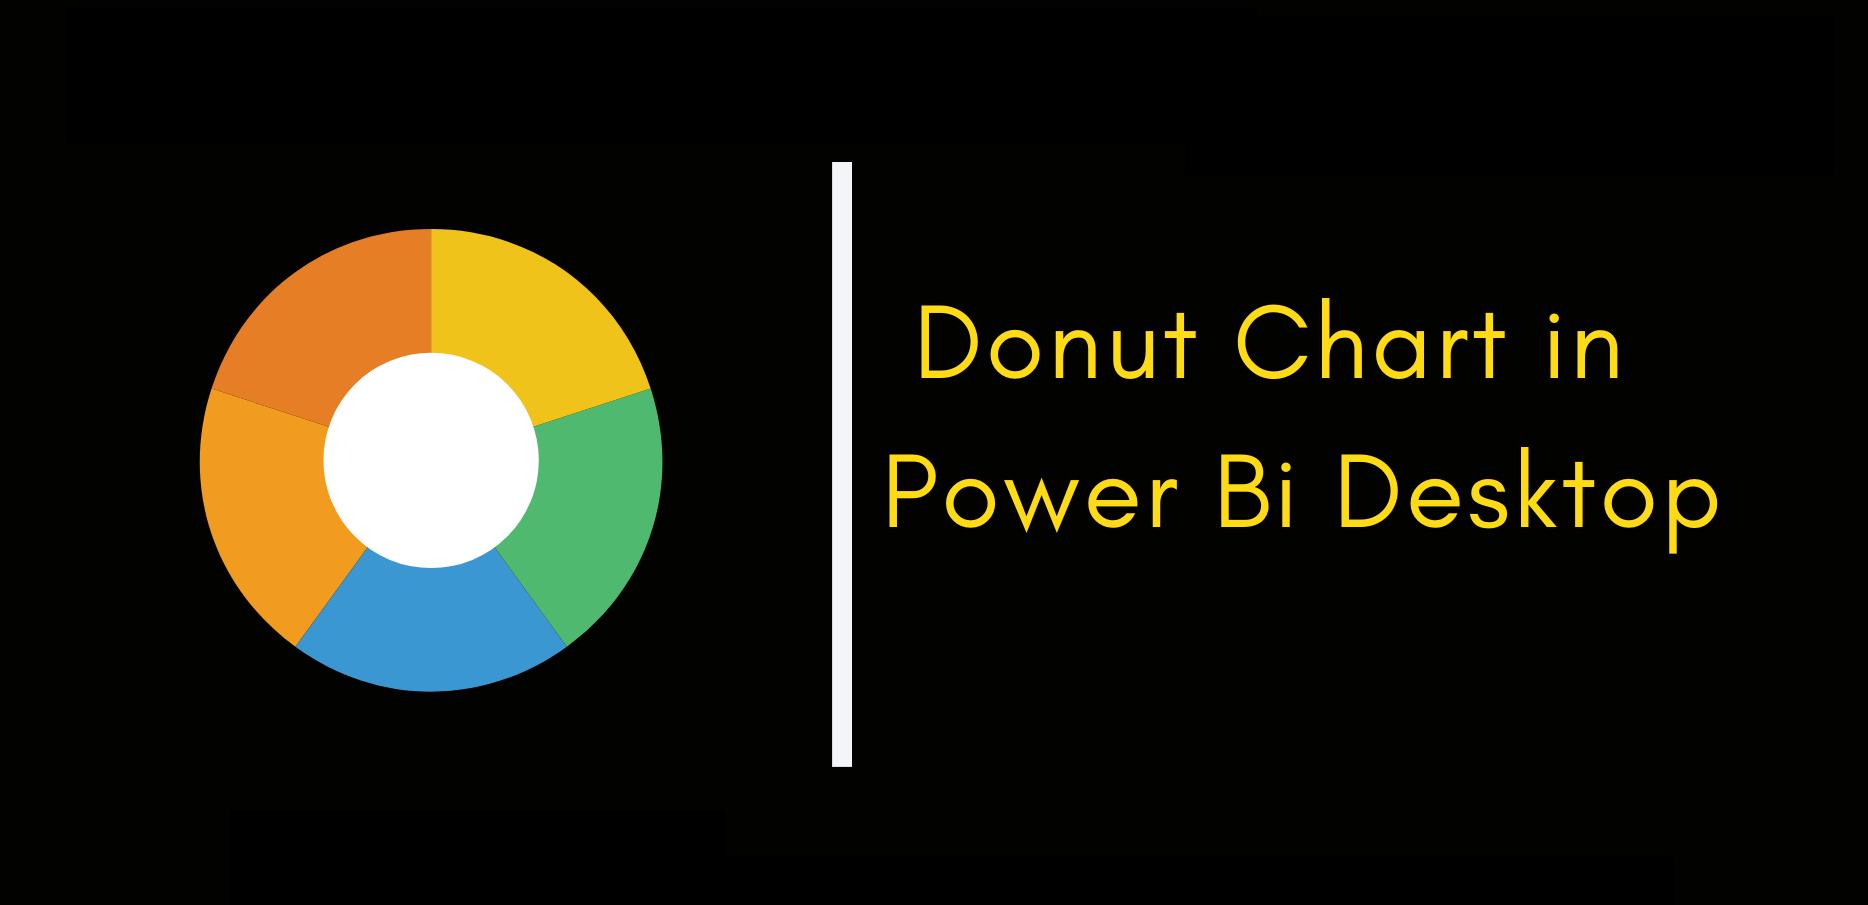 Donut Chart in Power Bi Desktop